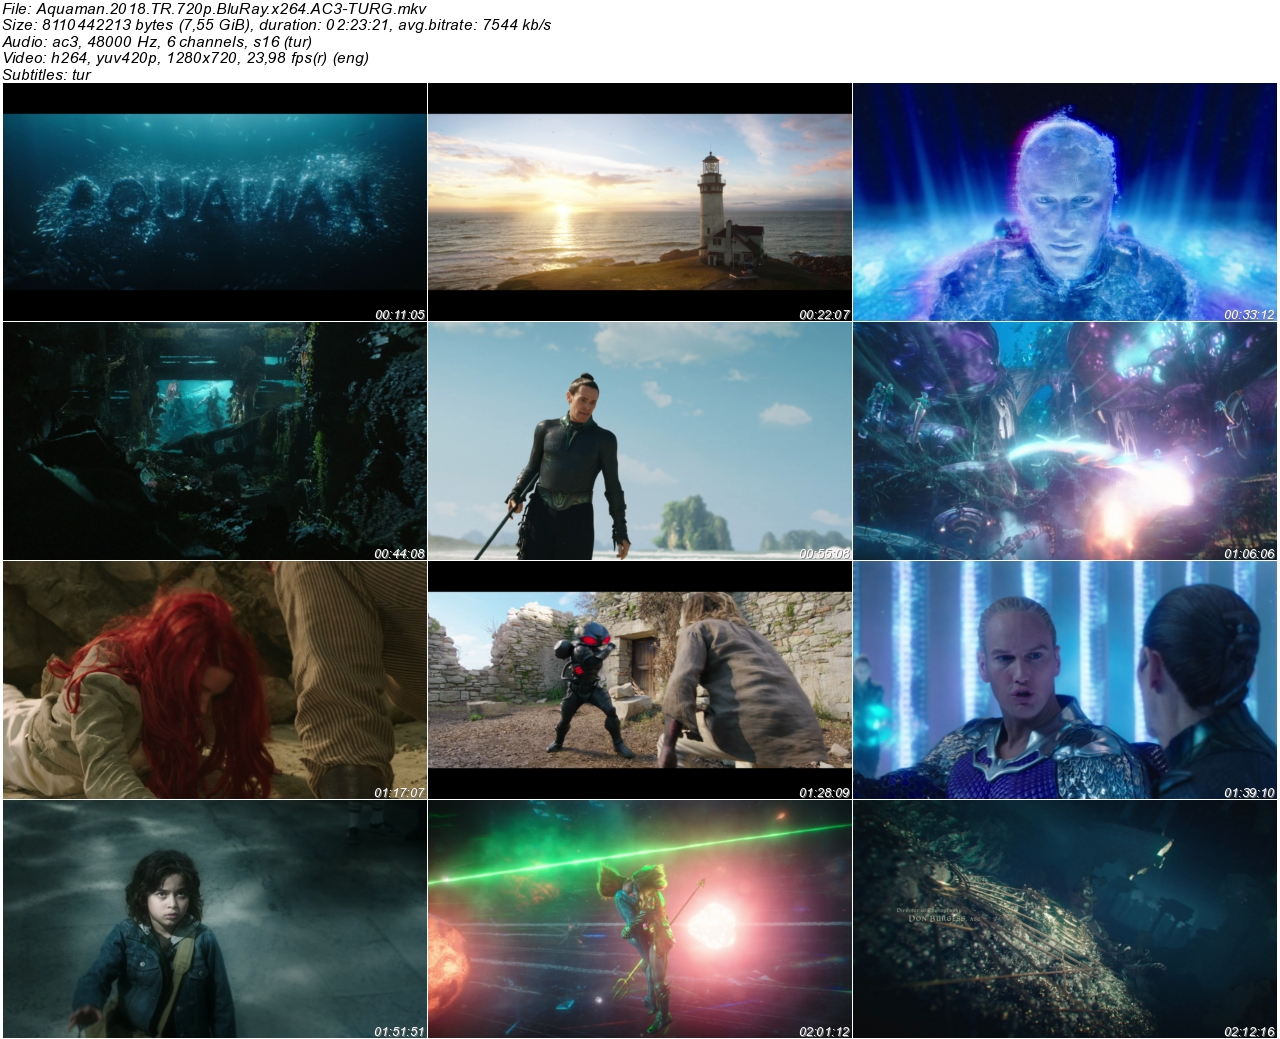 Aquaman 2018 1080p 720p 480p Türkçe Dublaj Tek Link Indir